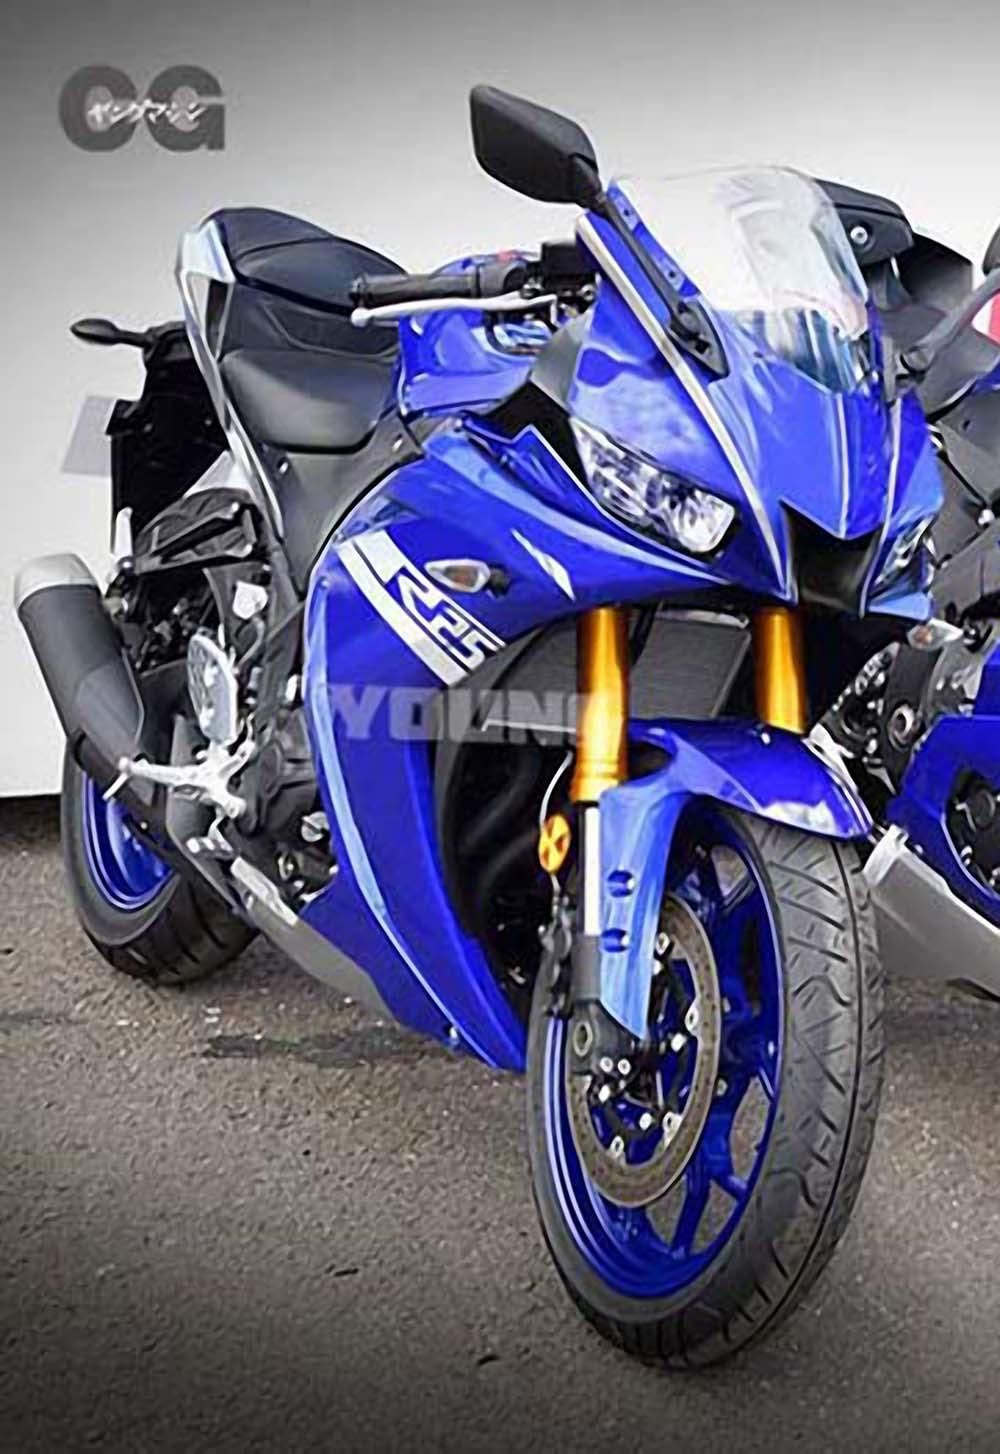 New Yamaha R25 render YM